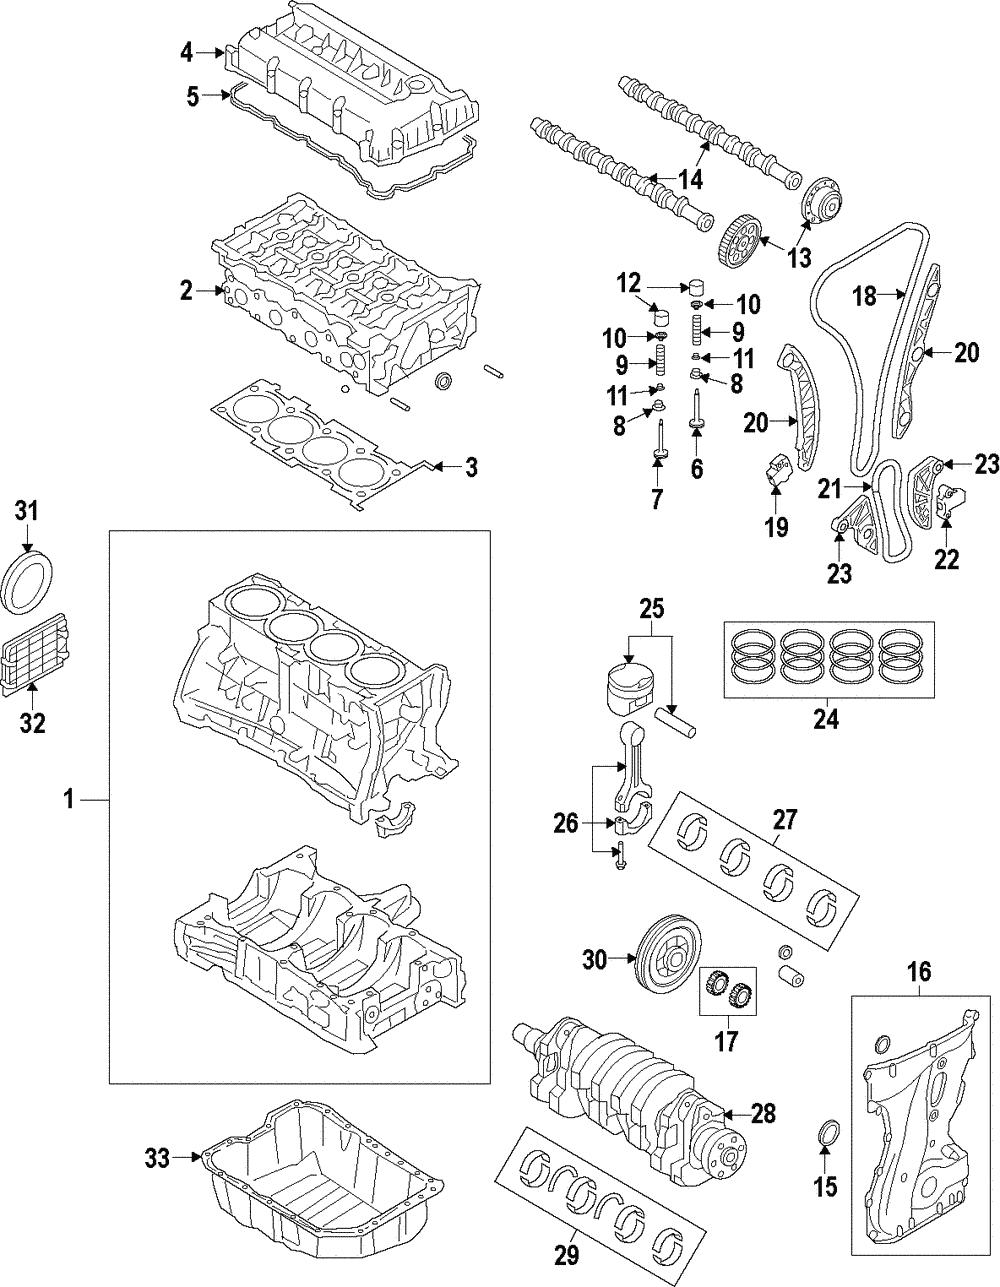 Brilliant Genuine Kia Intake Camshaft 24100 2G000 Ebay Wiring Digital Resources Anistprontobusorg